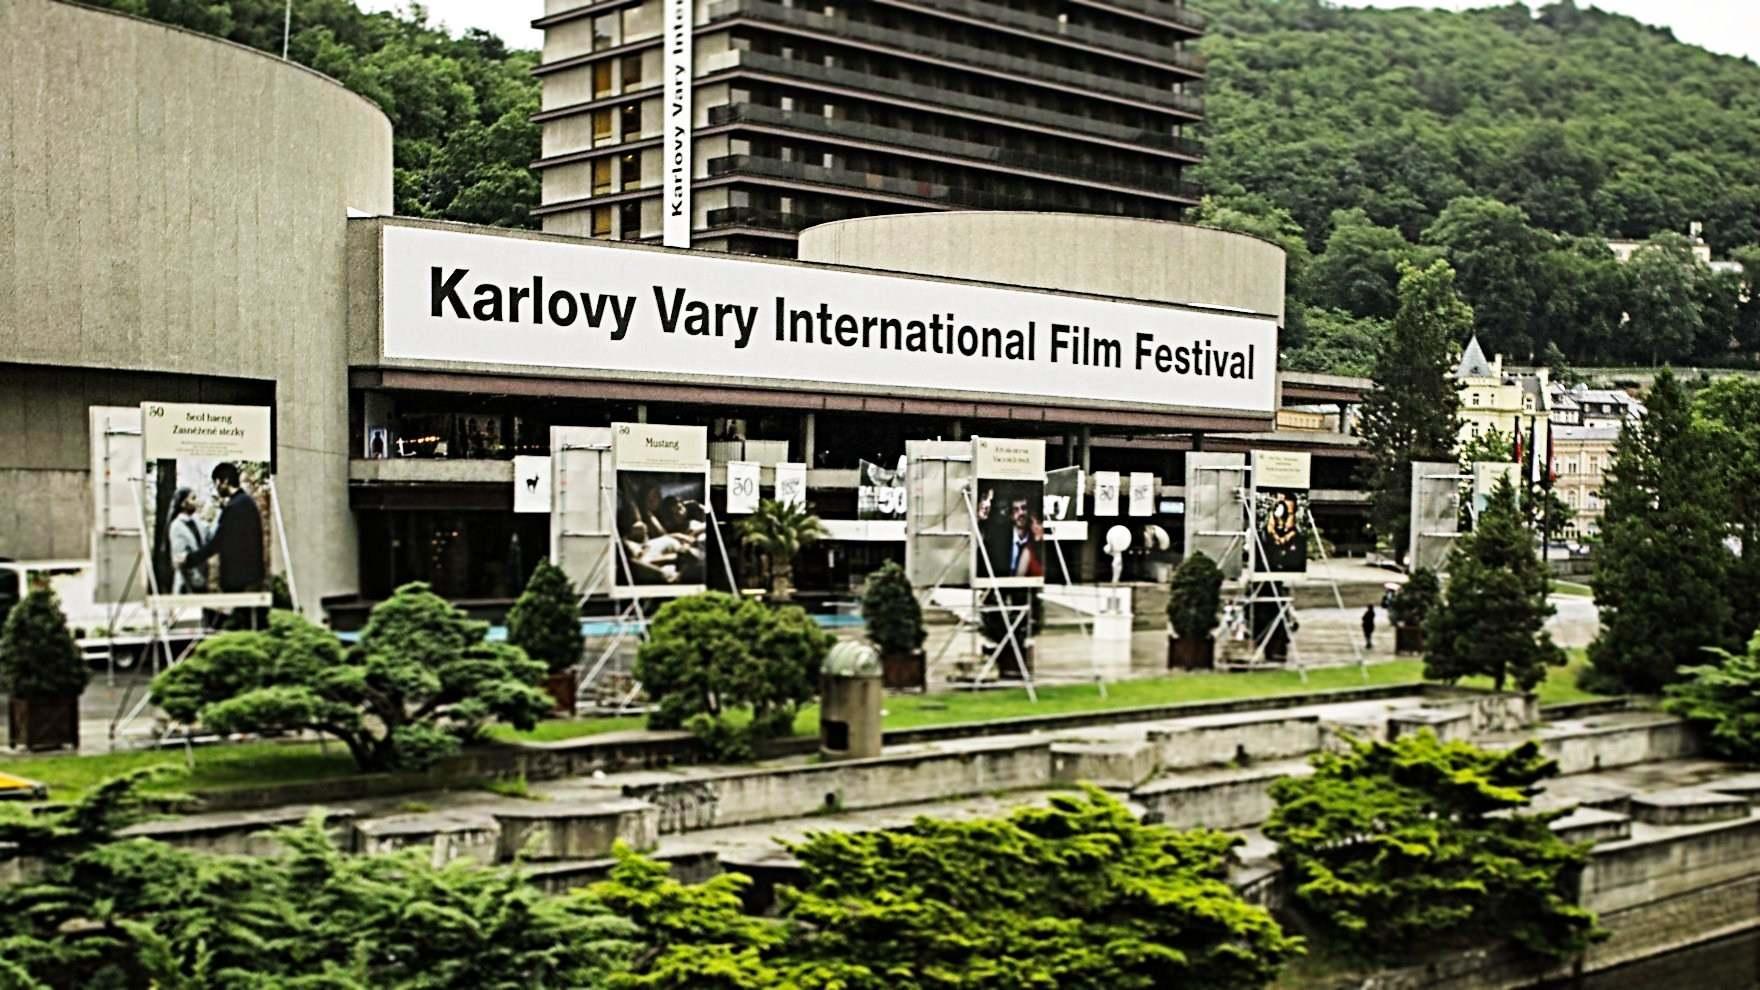 Filmfestival Karlovyvary, Foto (c) Cajetan Jacob